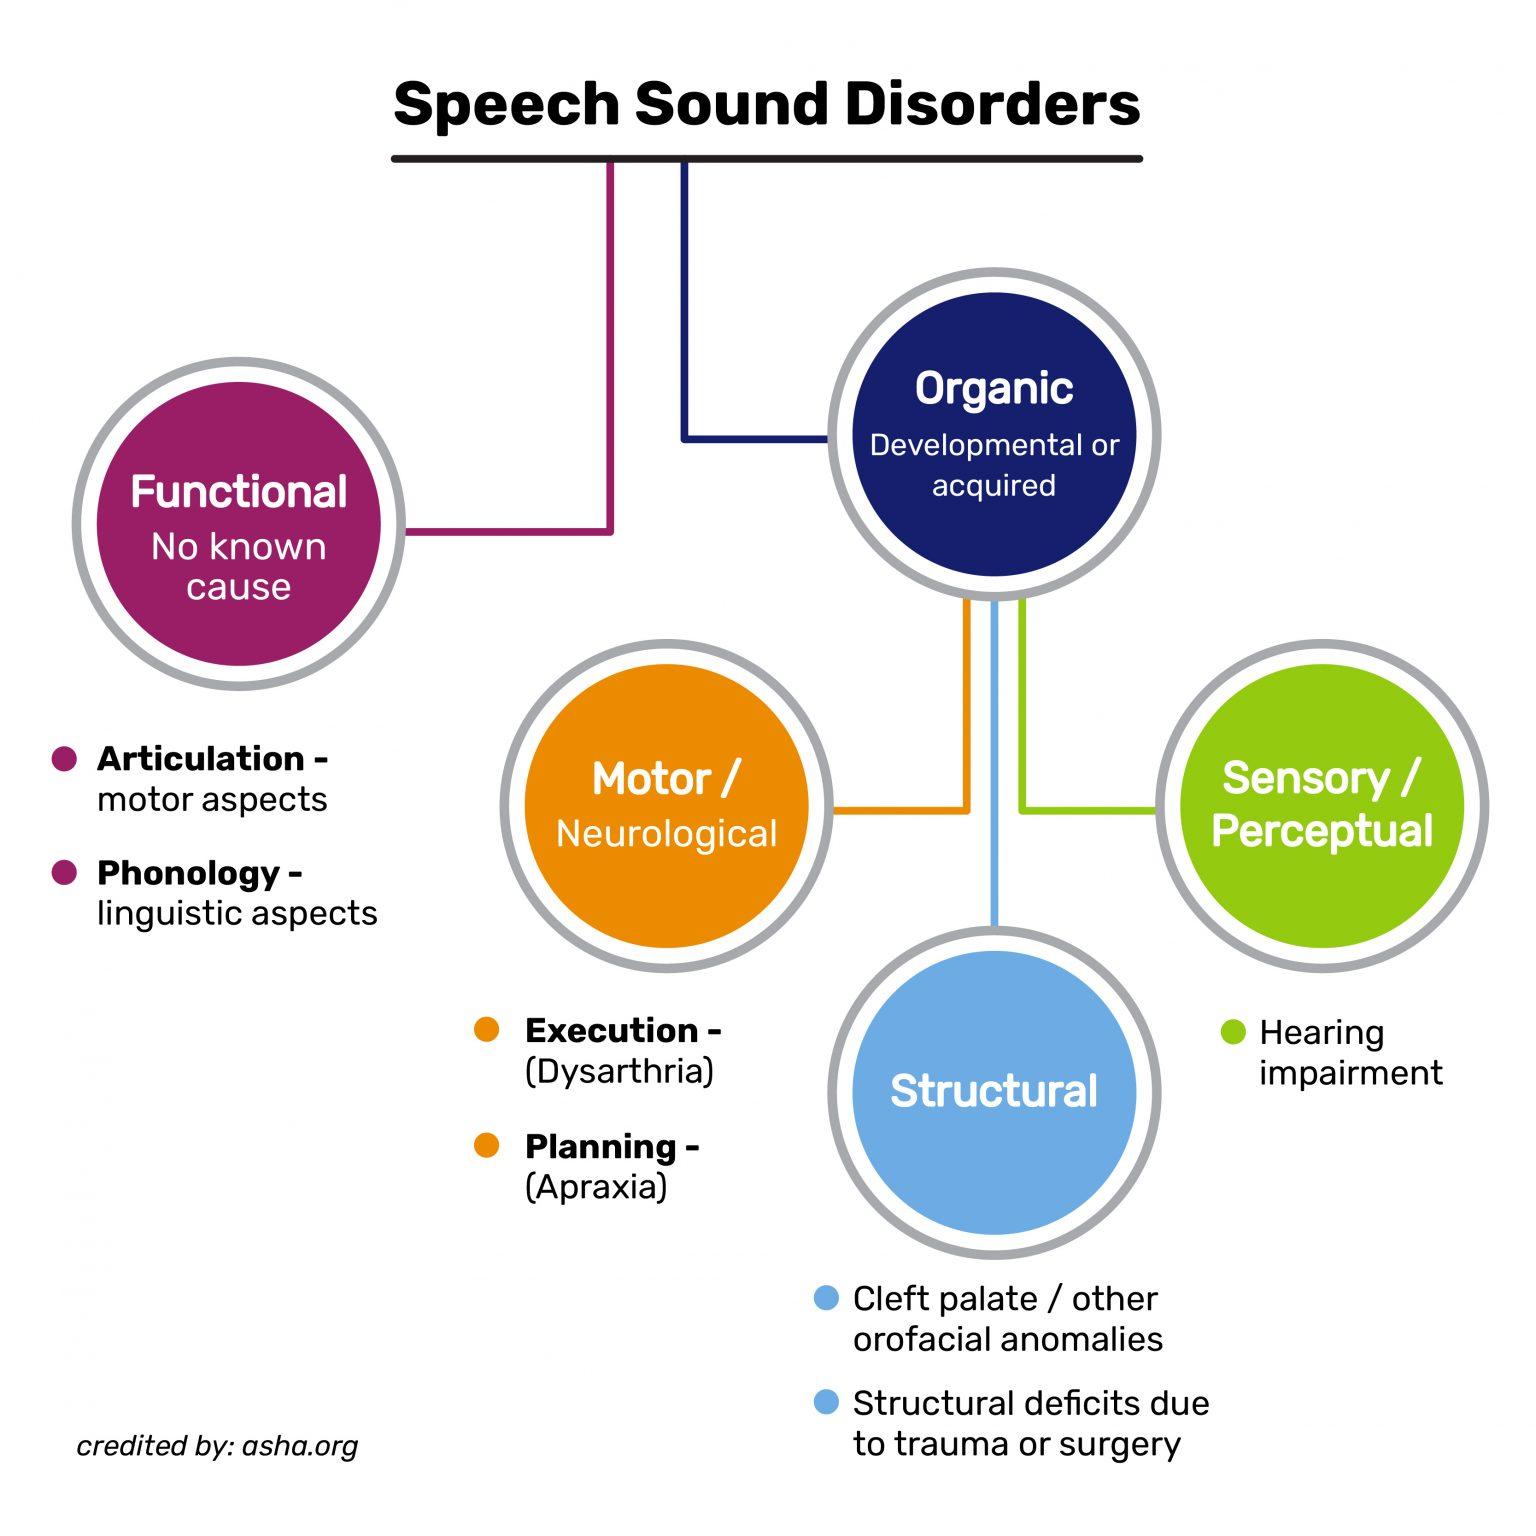 Speech Sound Disorders 1536x1536 1